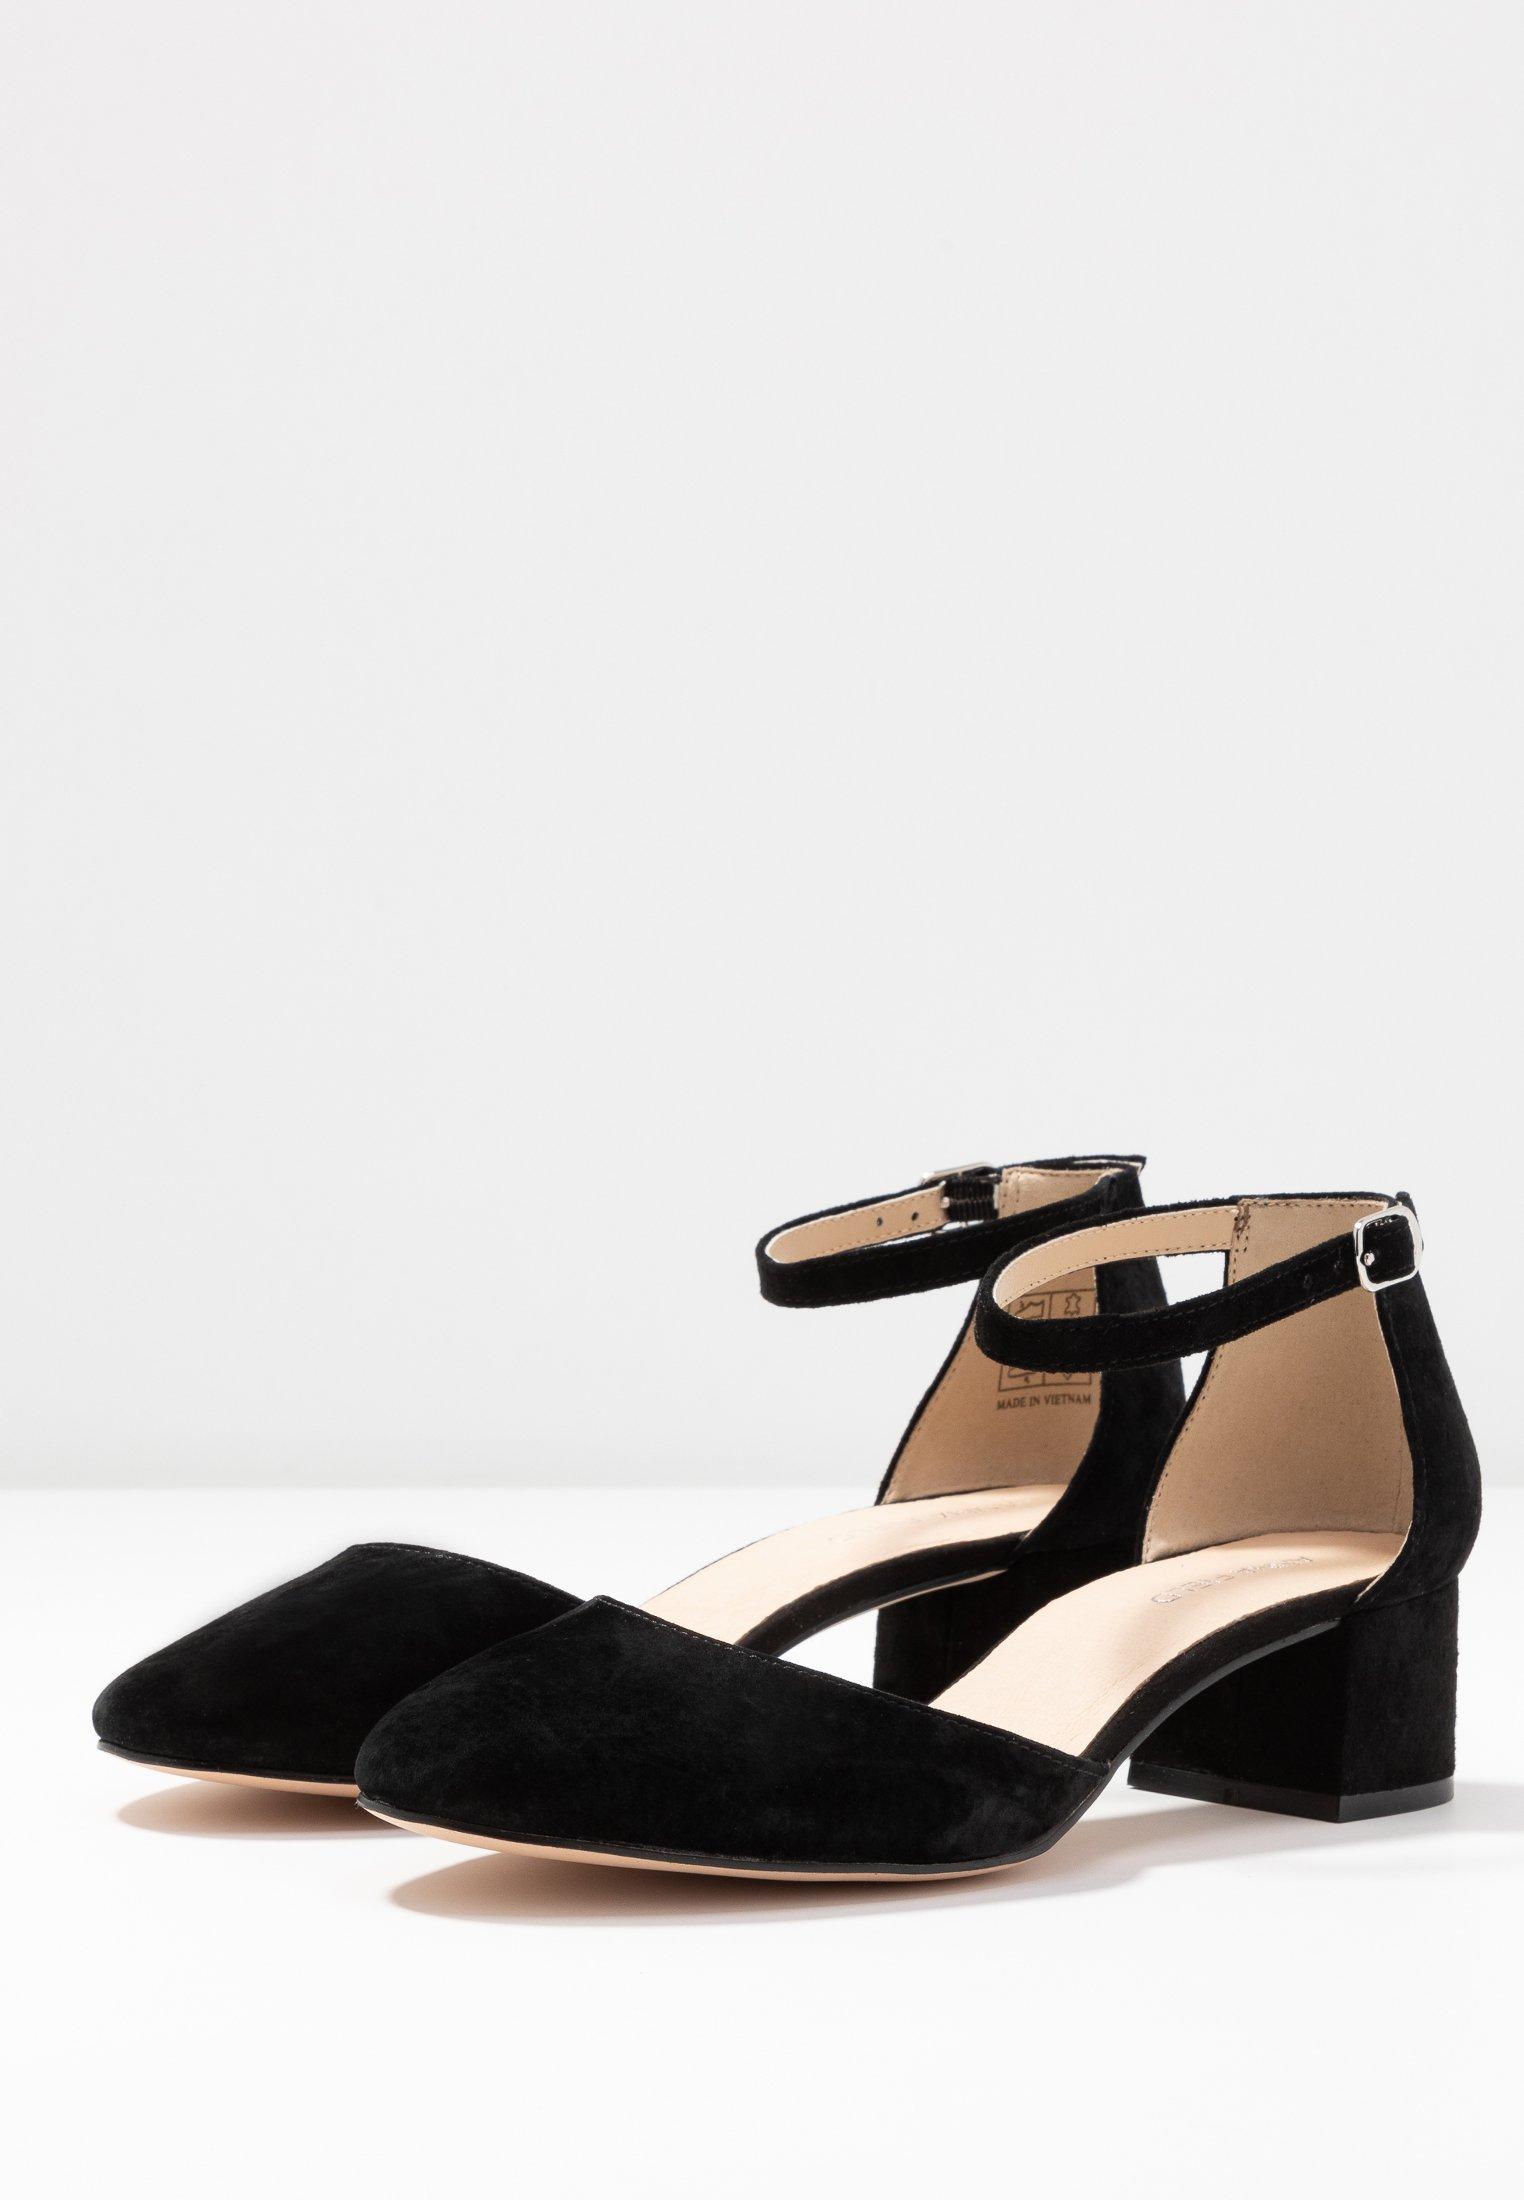 Anna Field Leather Classic Heels - Klassieke Pumps Black Goedkope Schoenen